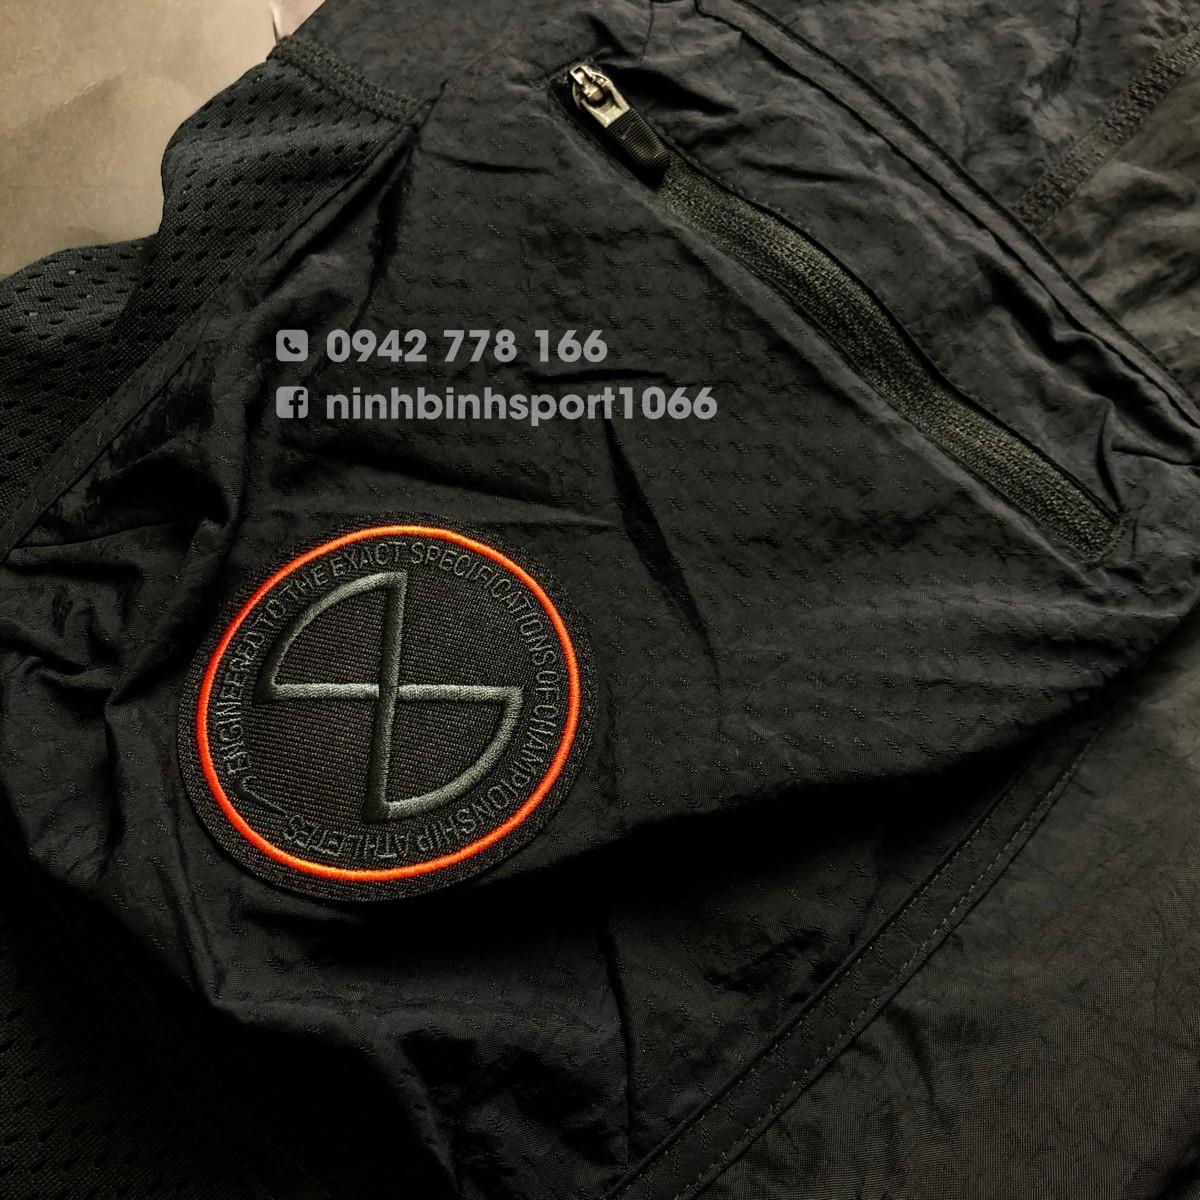 Quần thể thao nam Nike Training Trousers CU5002-010